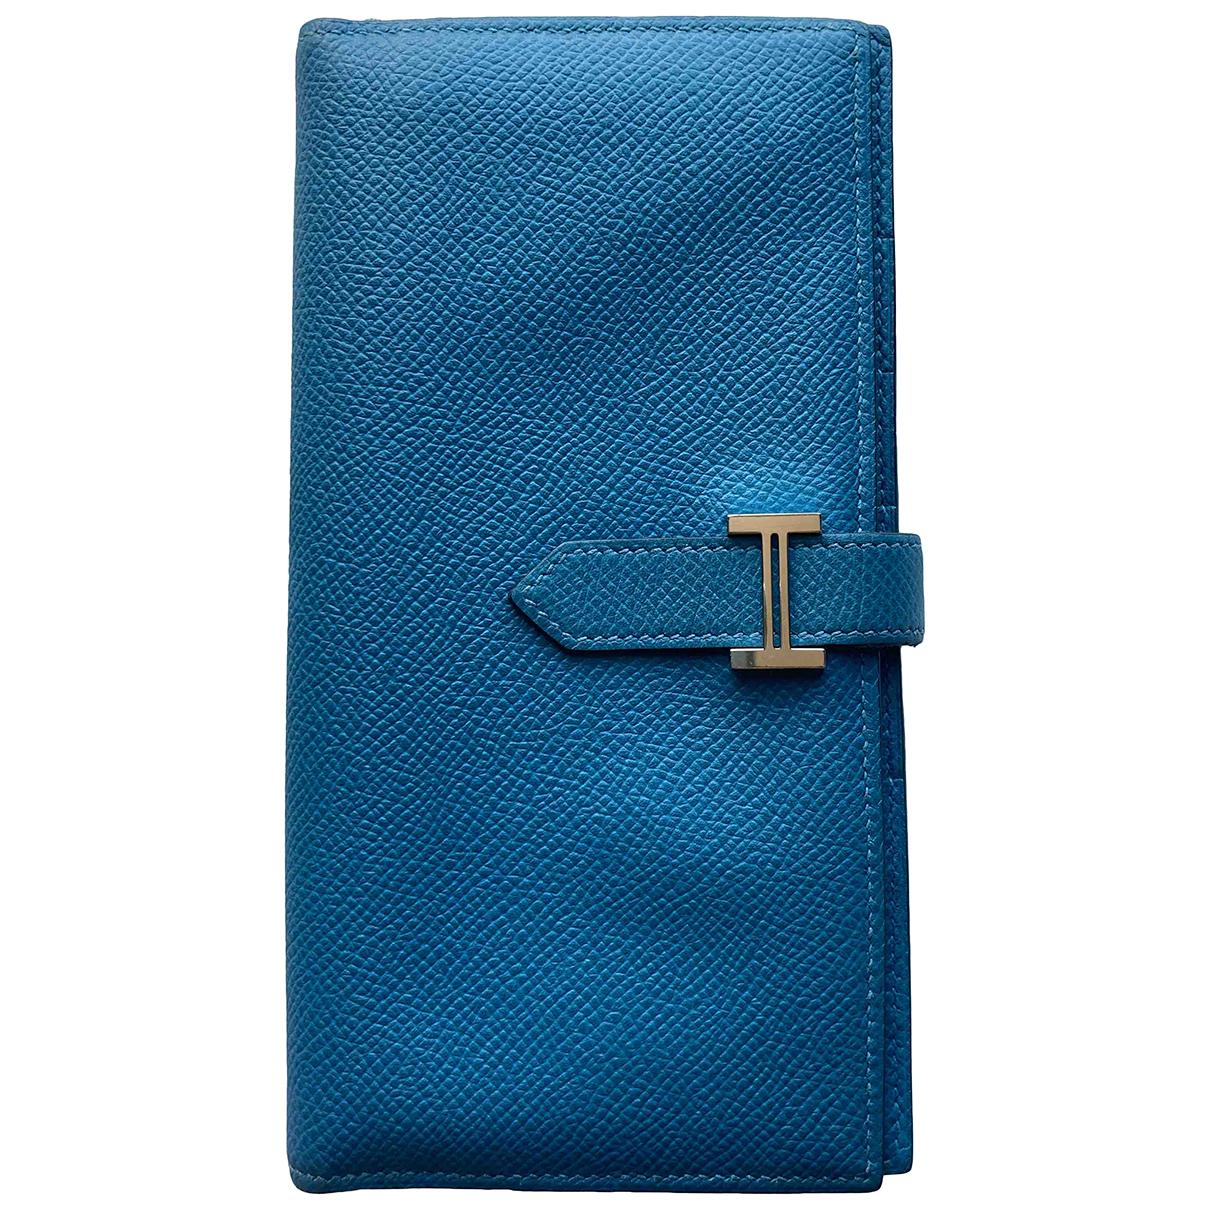 Hermes Bearn Portemonnaie in  Blau Leder